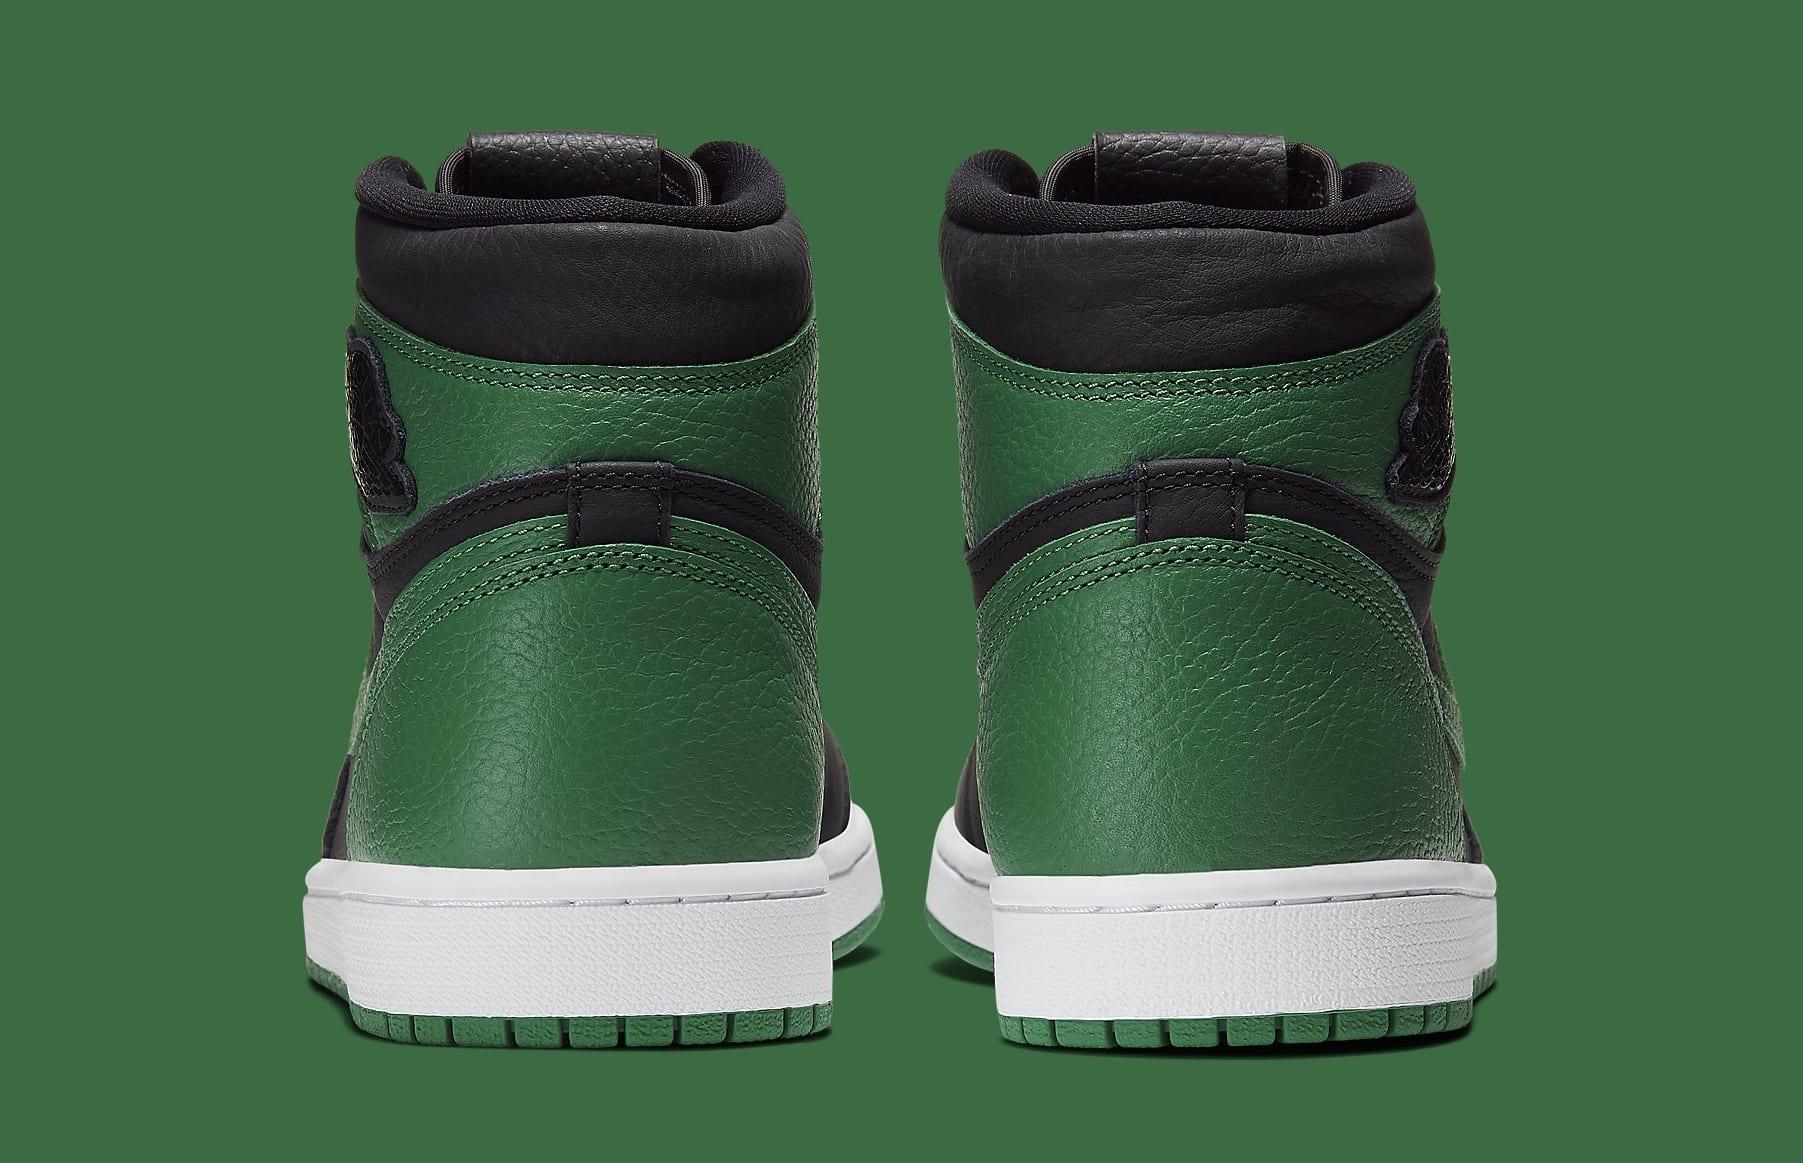 air-jordan-1-retro-high-og-pine-green-555088-030-heel